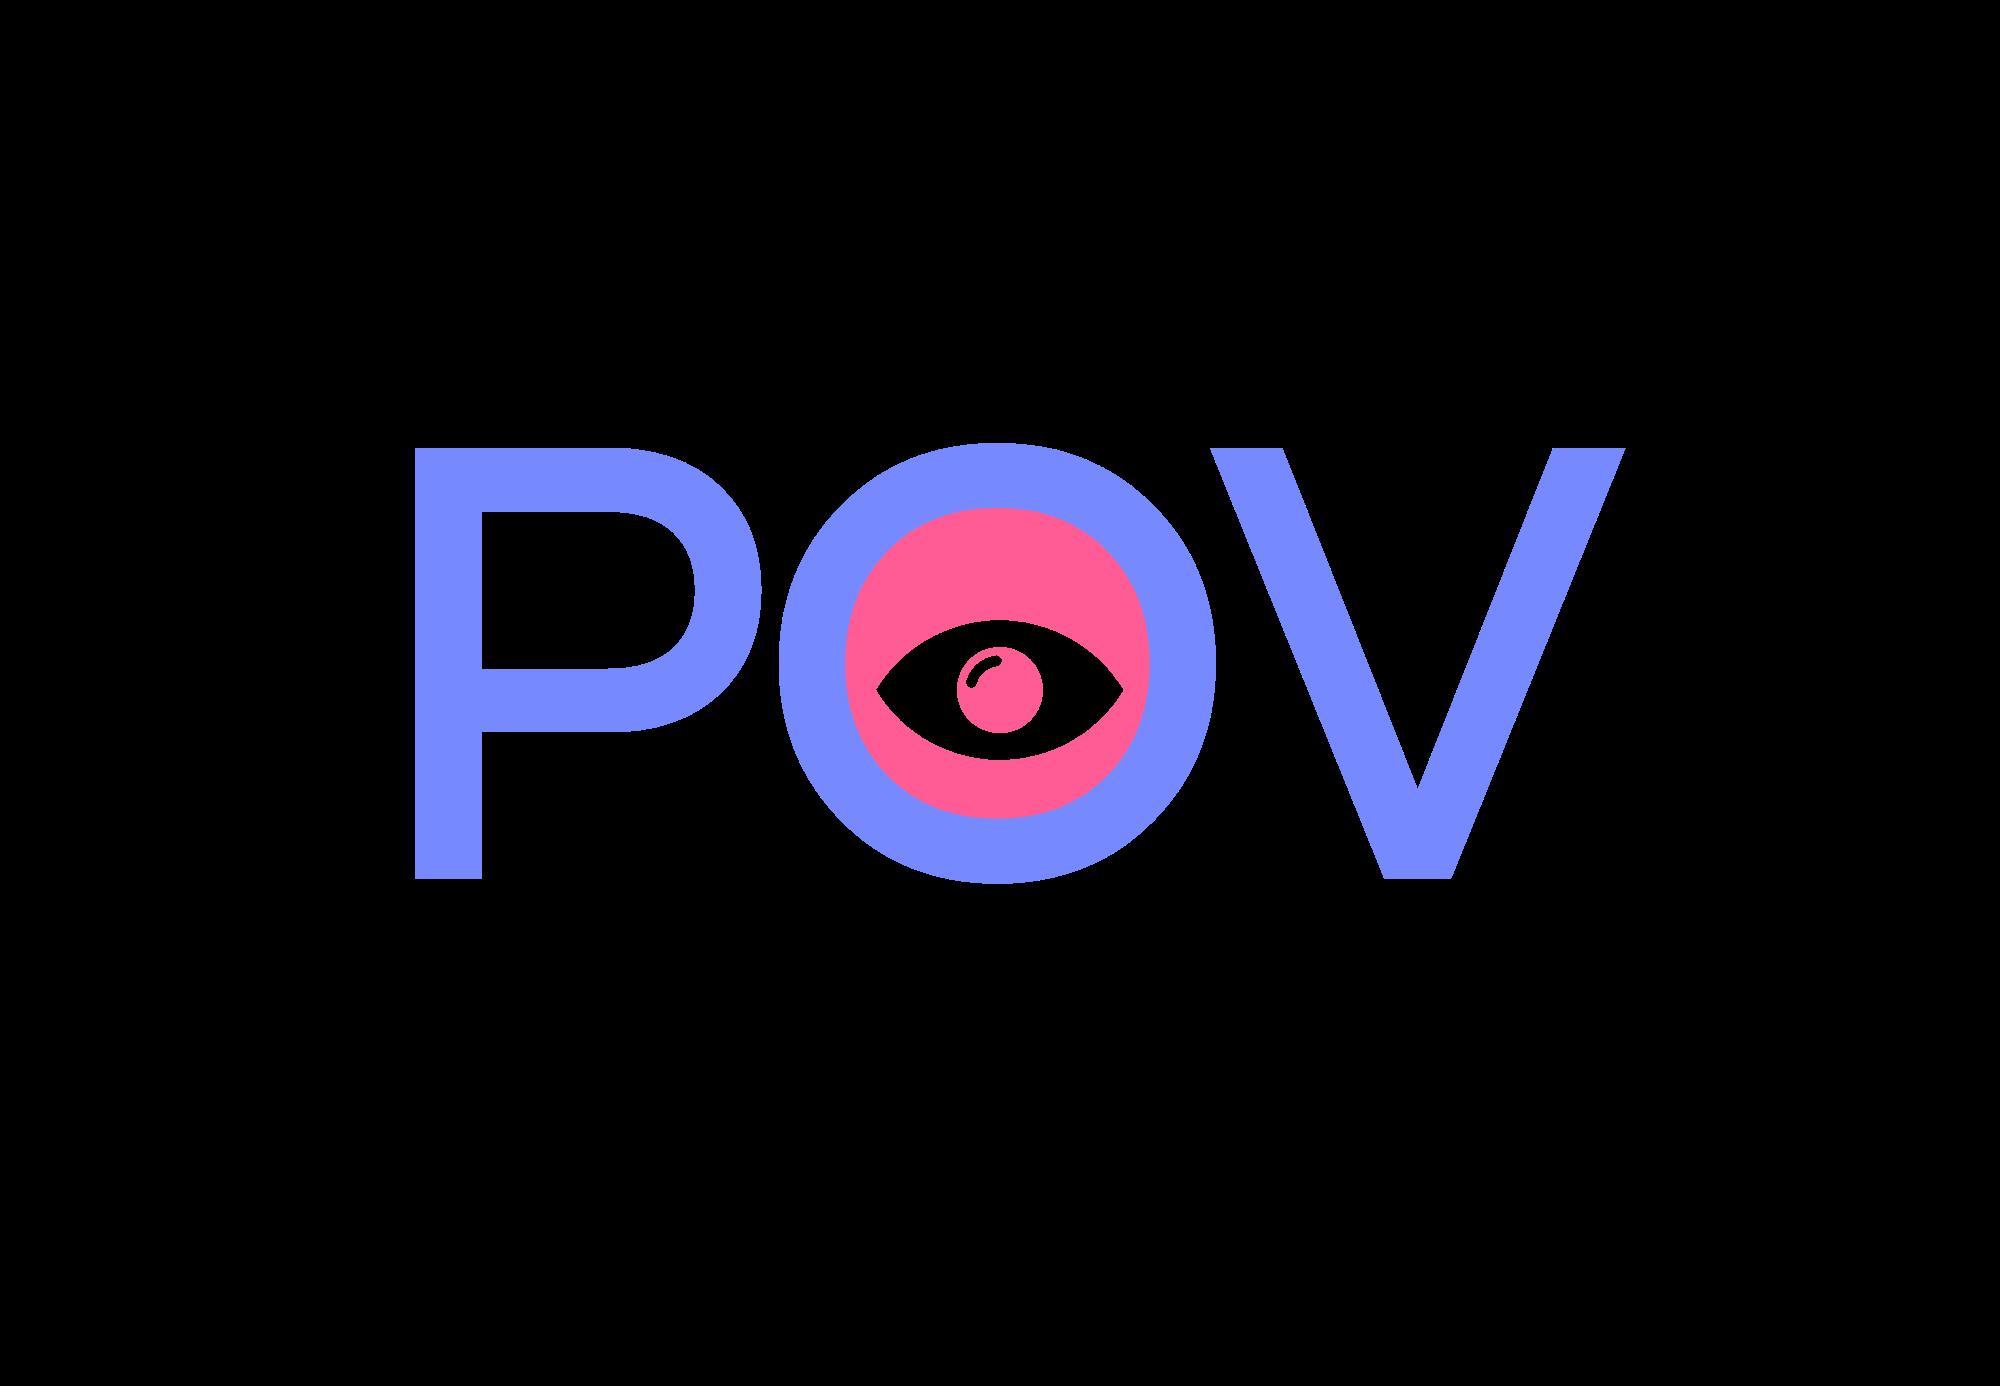 Copy of Copy of POV